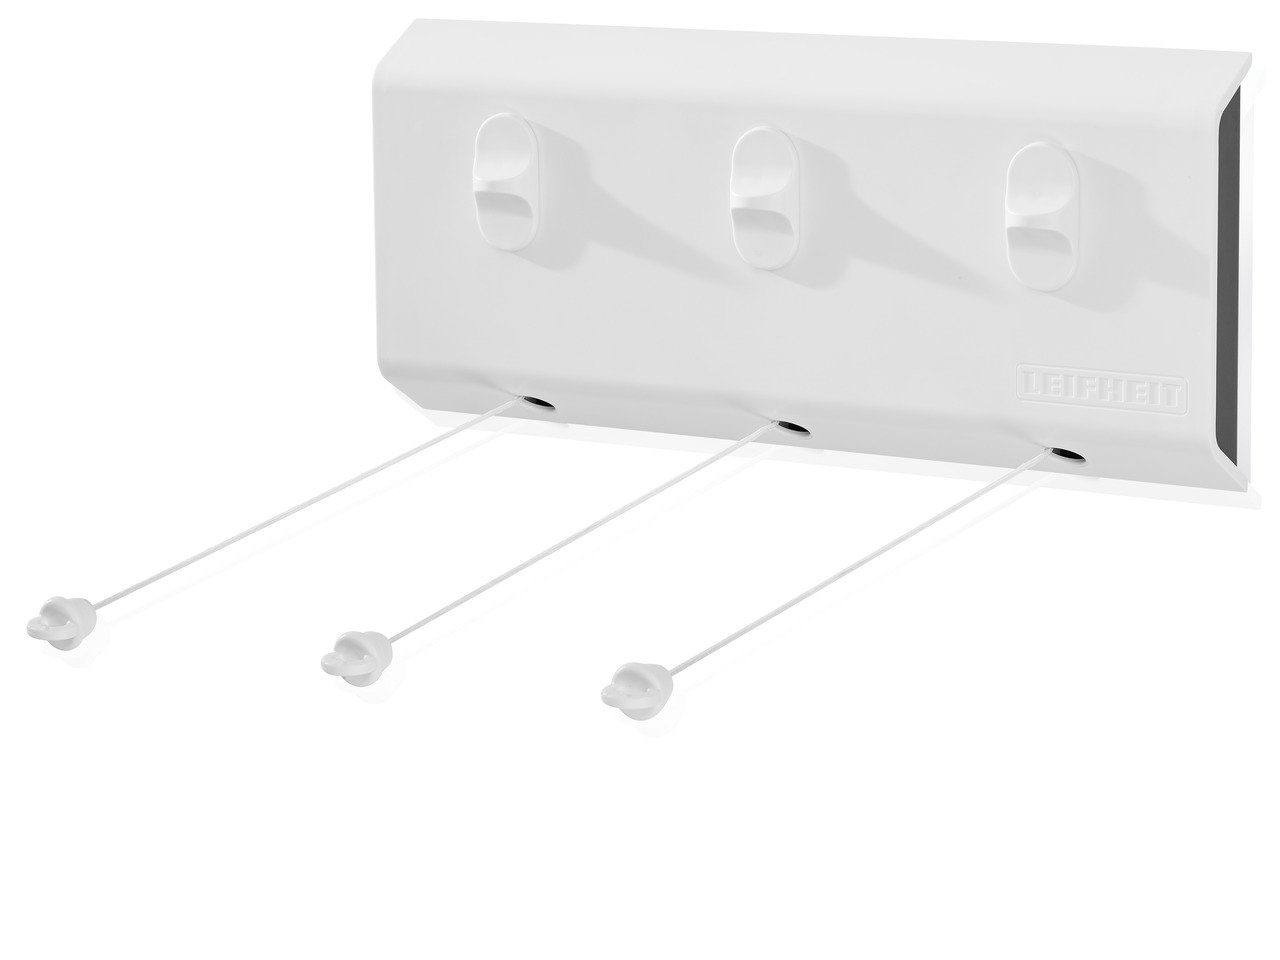 Leifheit Rollfix 150 Triple Longline Stendibiancheria a Parete 15.5x4.7x35 cm Bianco PVC